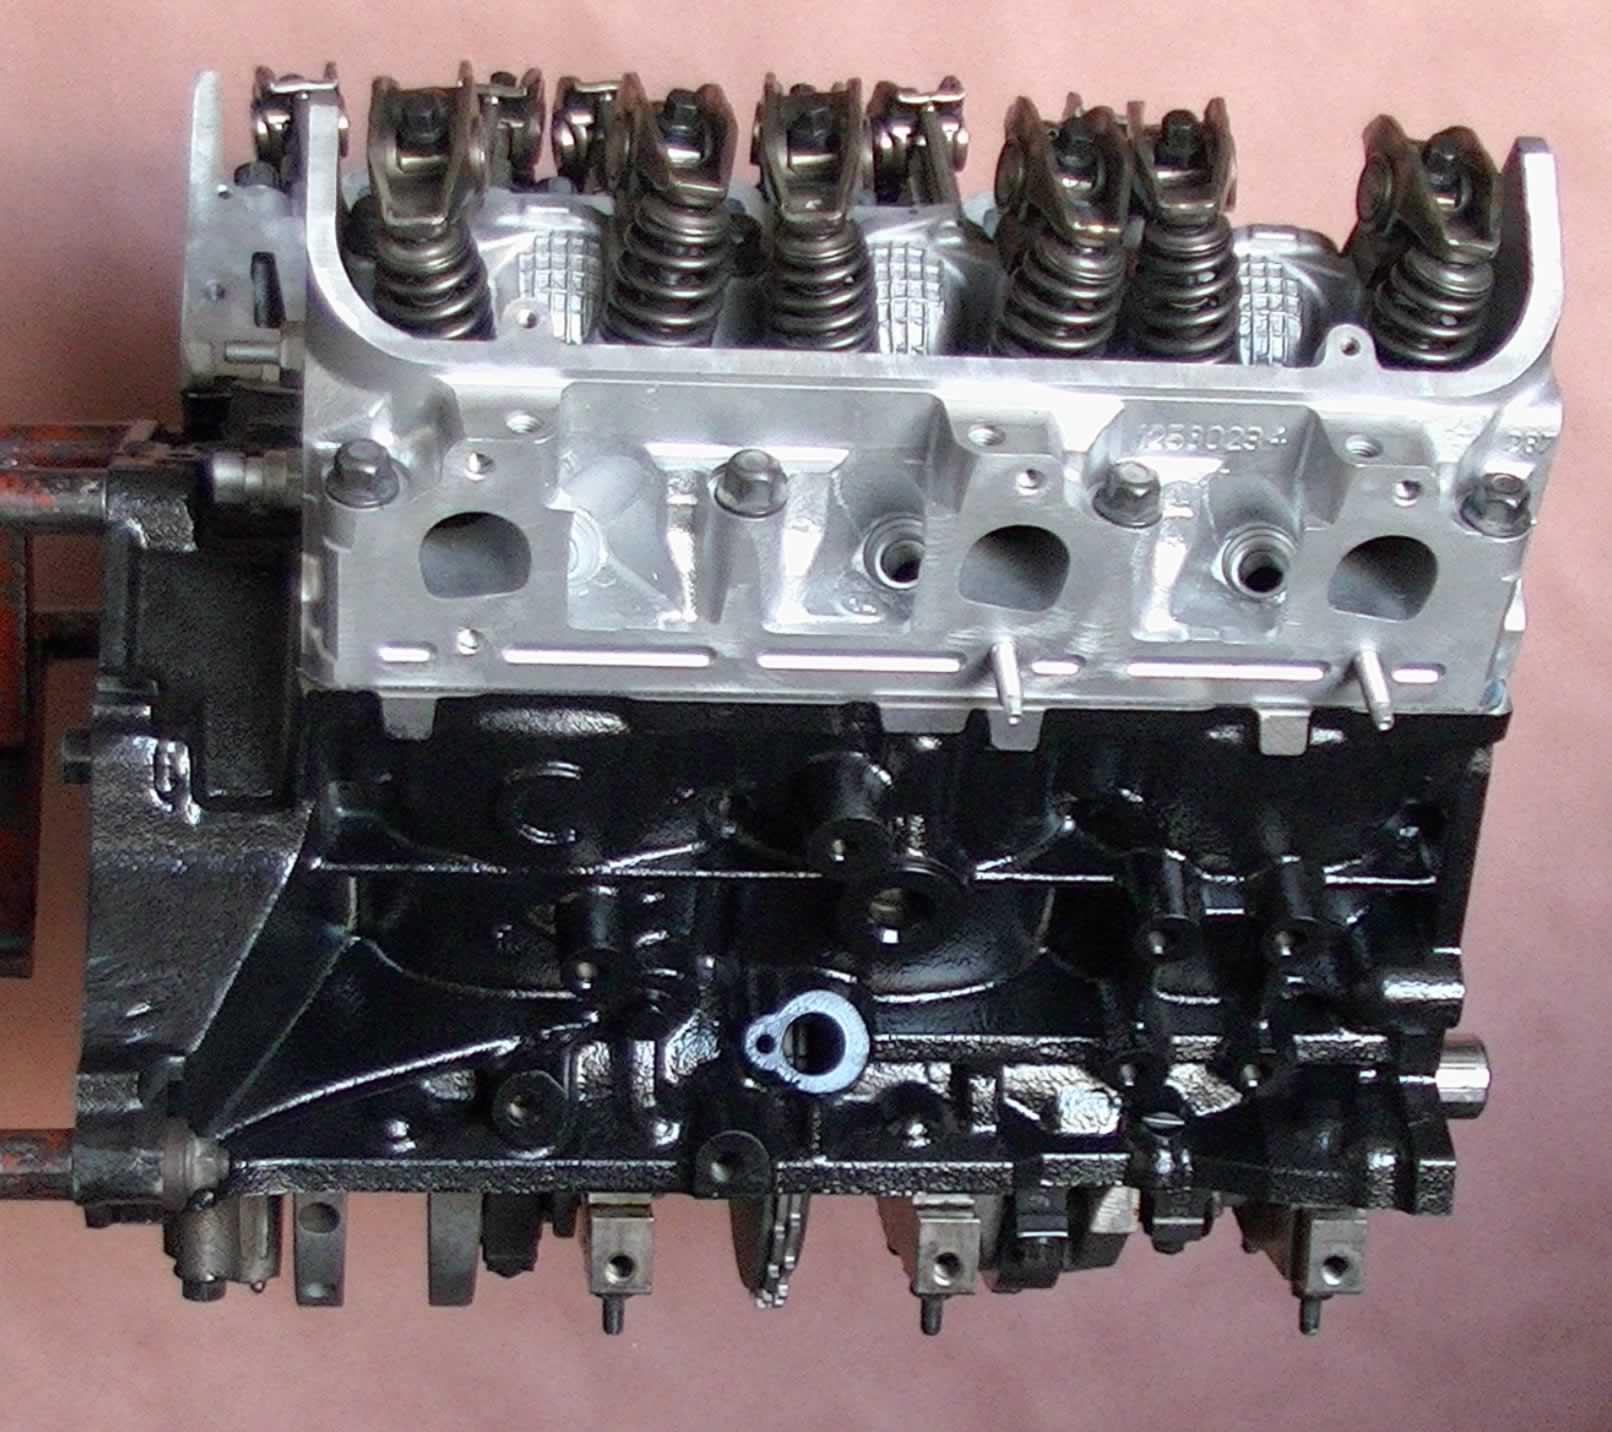 Rebuilt 2006 Pontiac Torrent 3.4L Longblock Engine « Kar ...